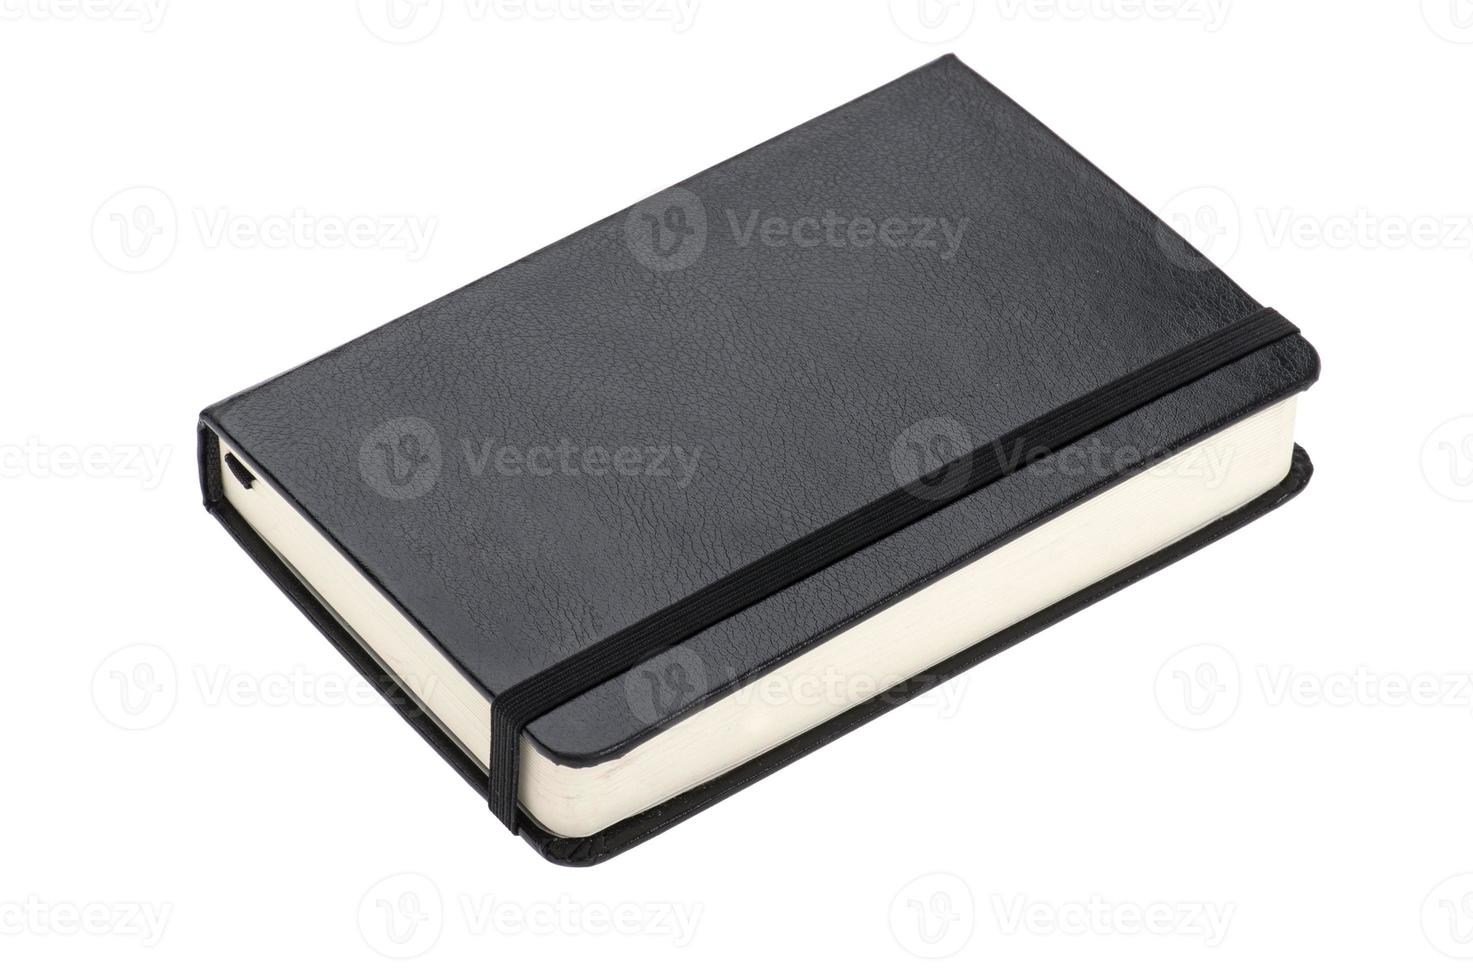 manuale su bianco foto